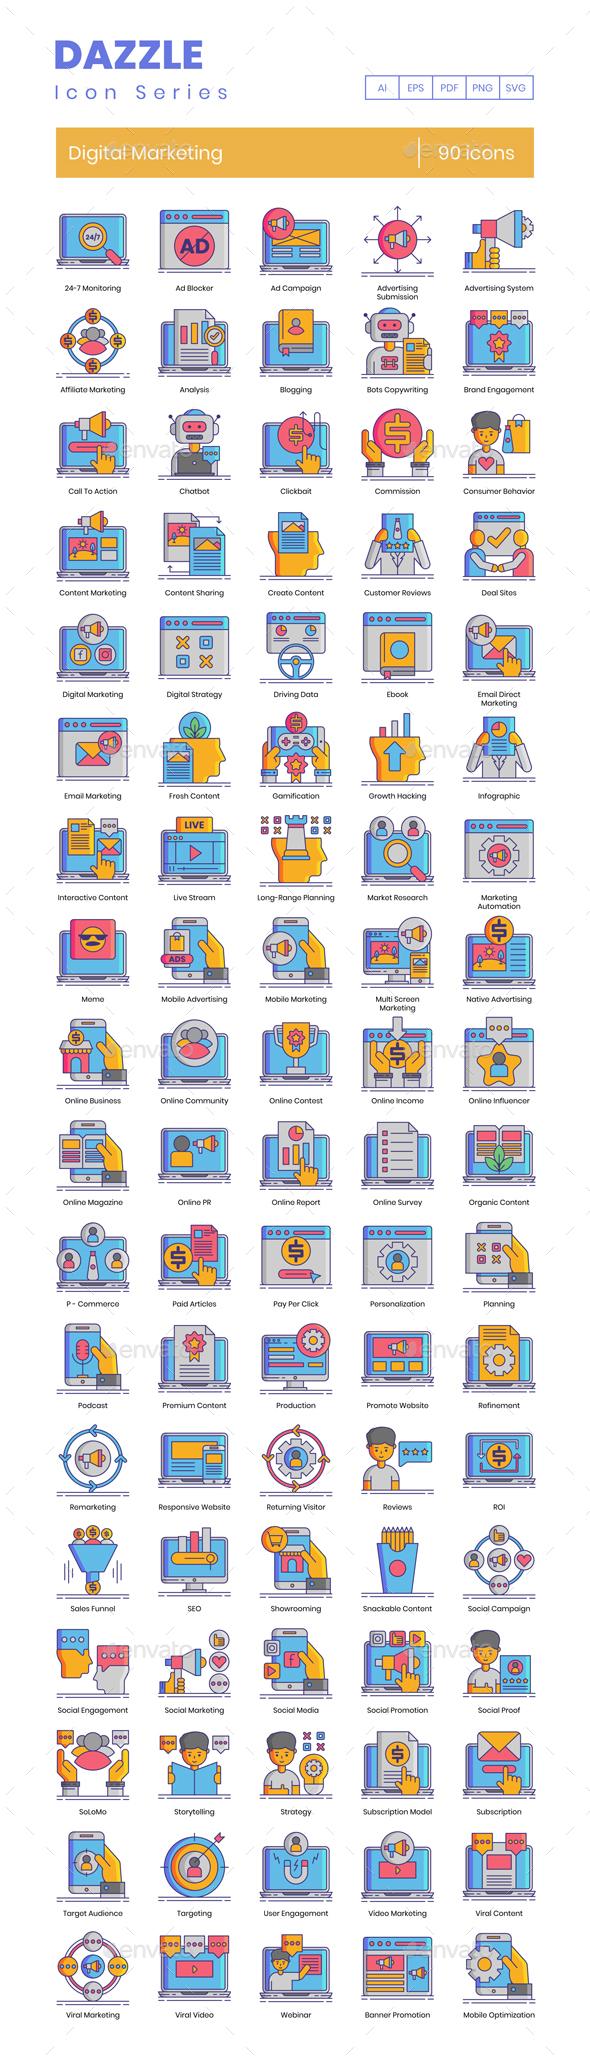 90 Digital Marketing Icons - Dazzle Series